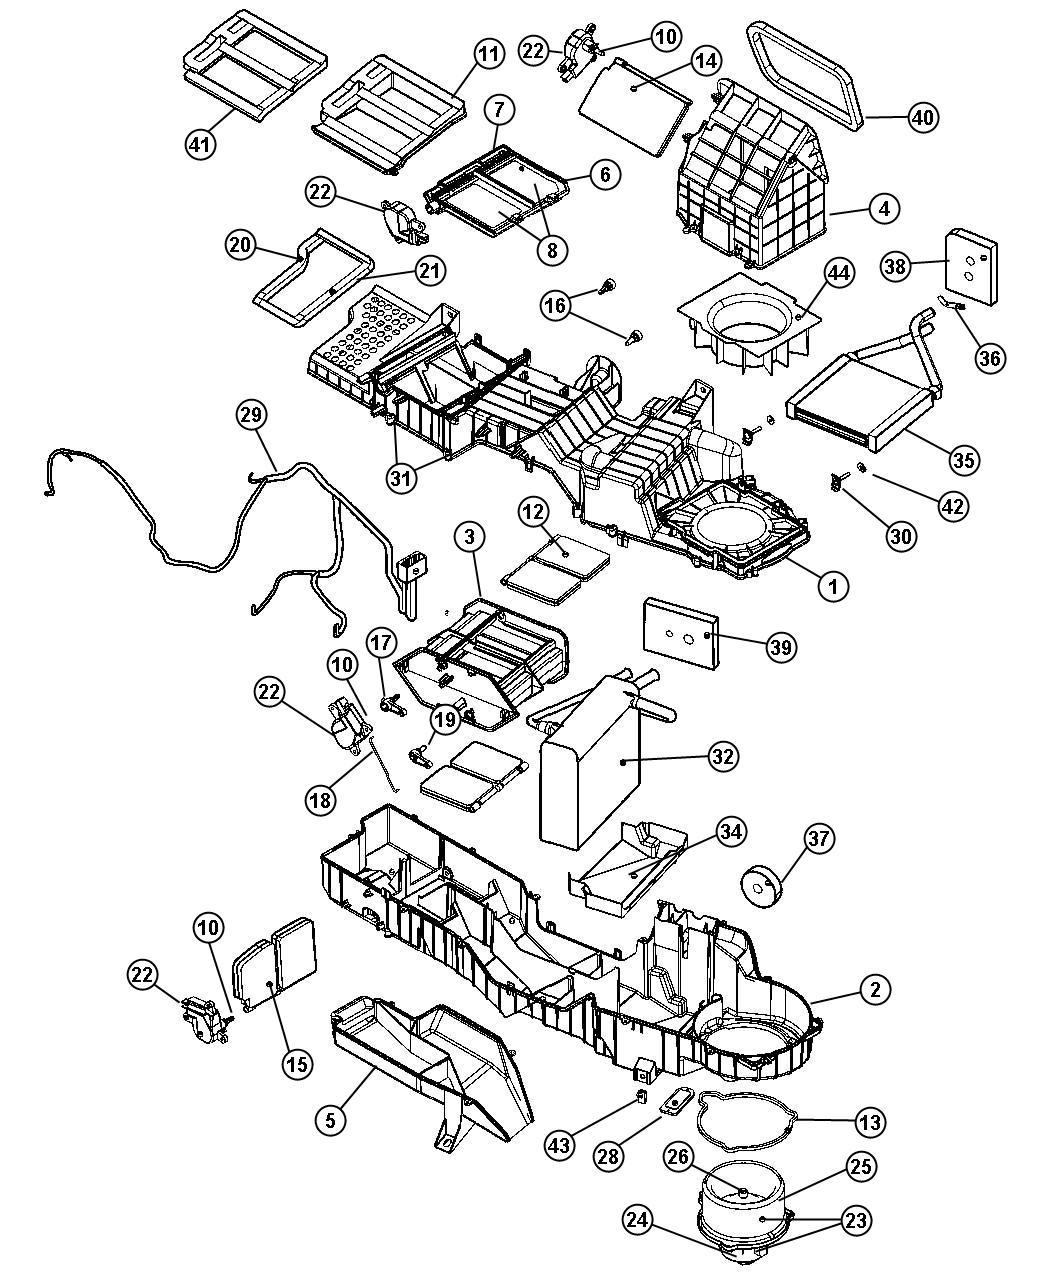 2000 dodge ram heater diagram